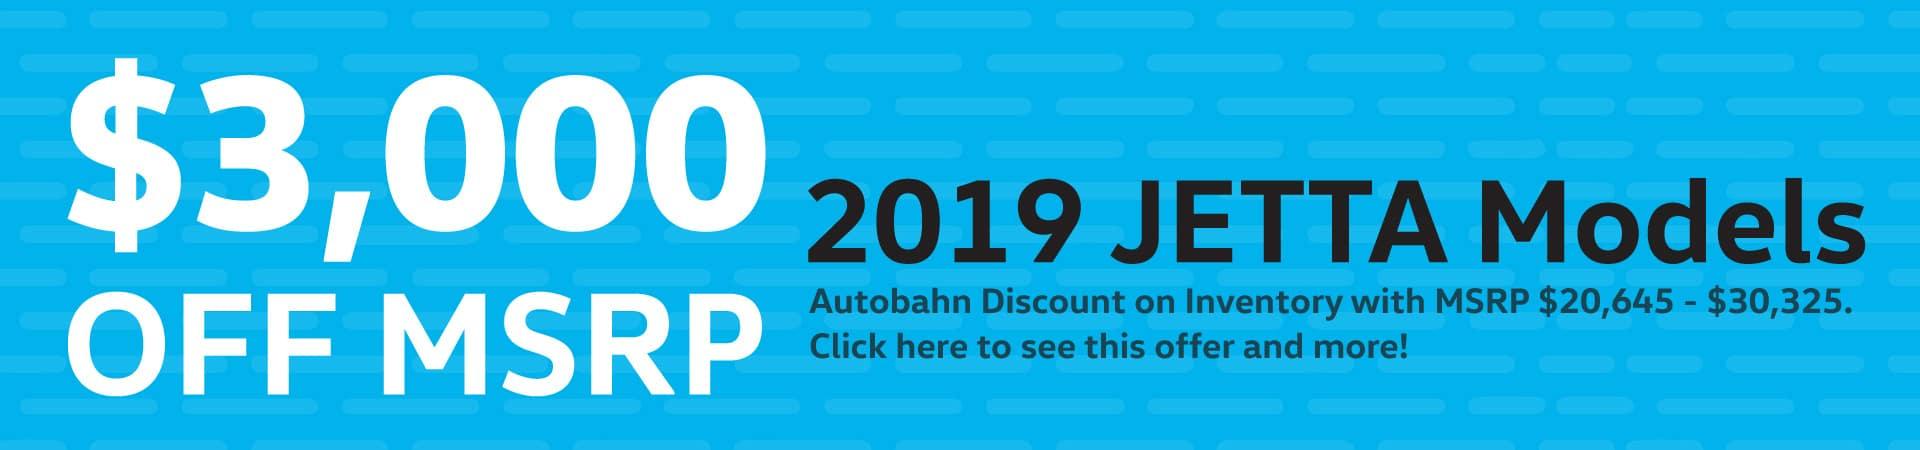 Autobahn Volkswagen | Jetta OFF MSRP Special